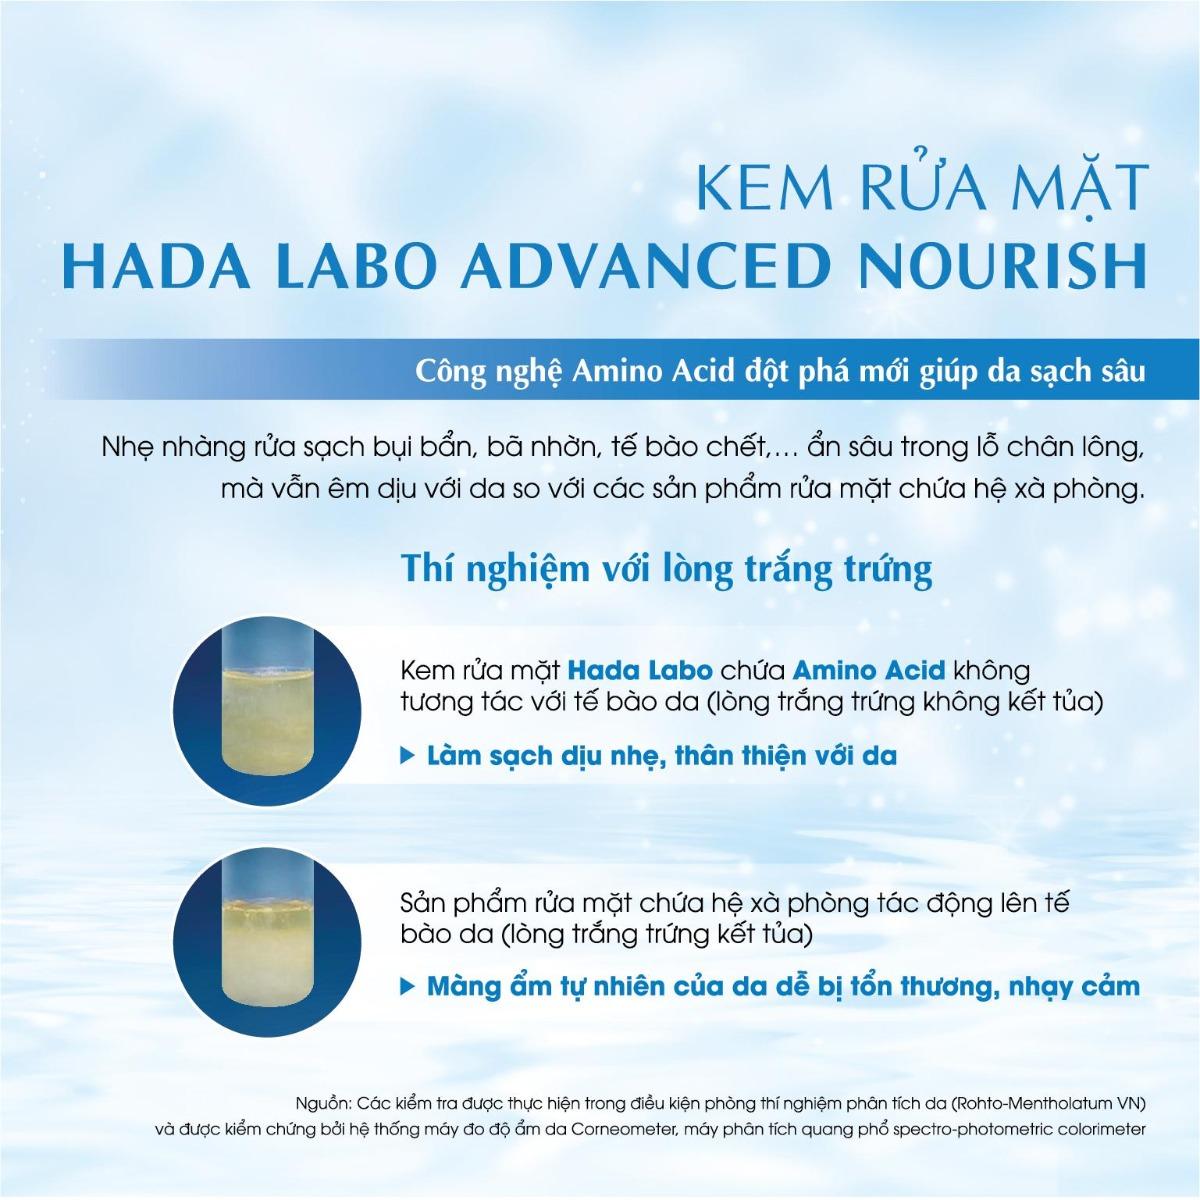 Kem Rửa Mặt Hada Labo Advanced Nourish Cream Cleanser làm sạch dịu nhẹ, thân thiện với da